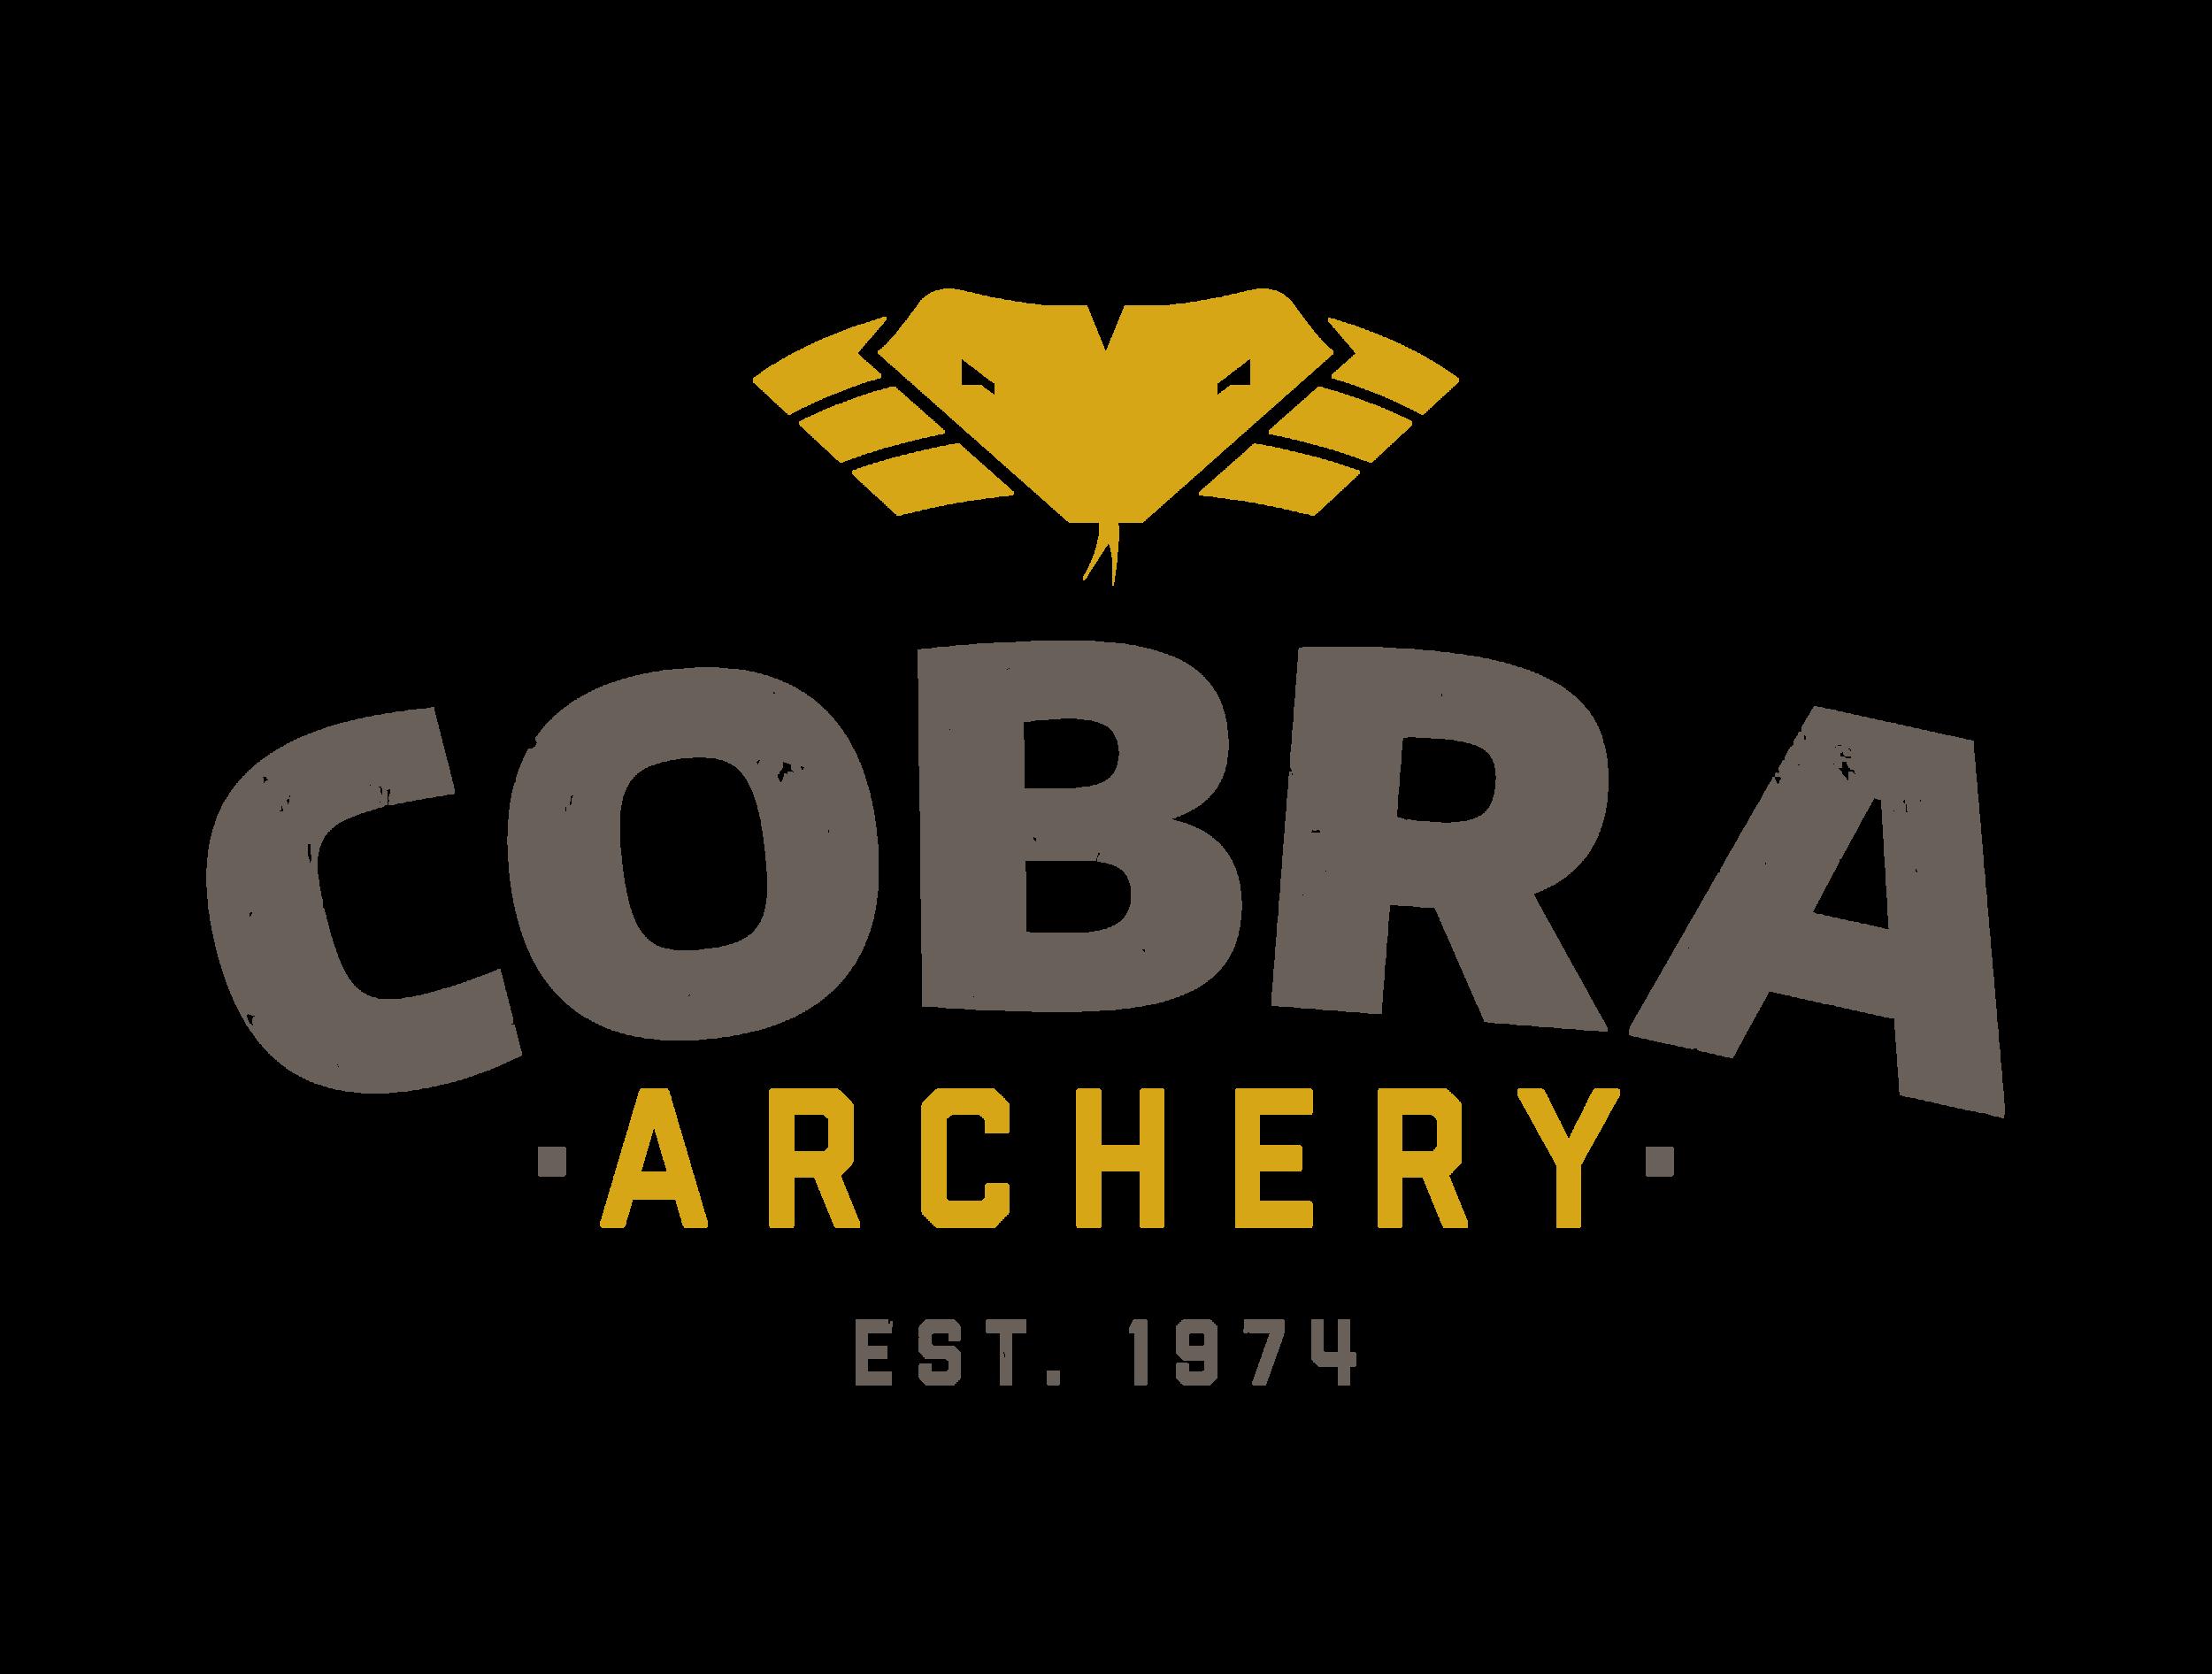 Cobra-Archery-Logo-Primary-Grunge.png